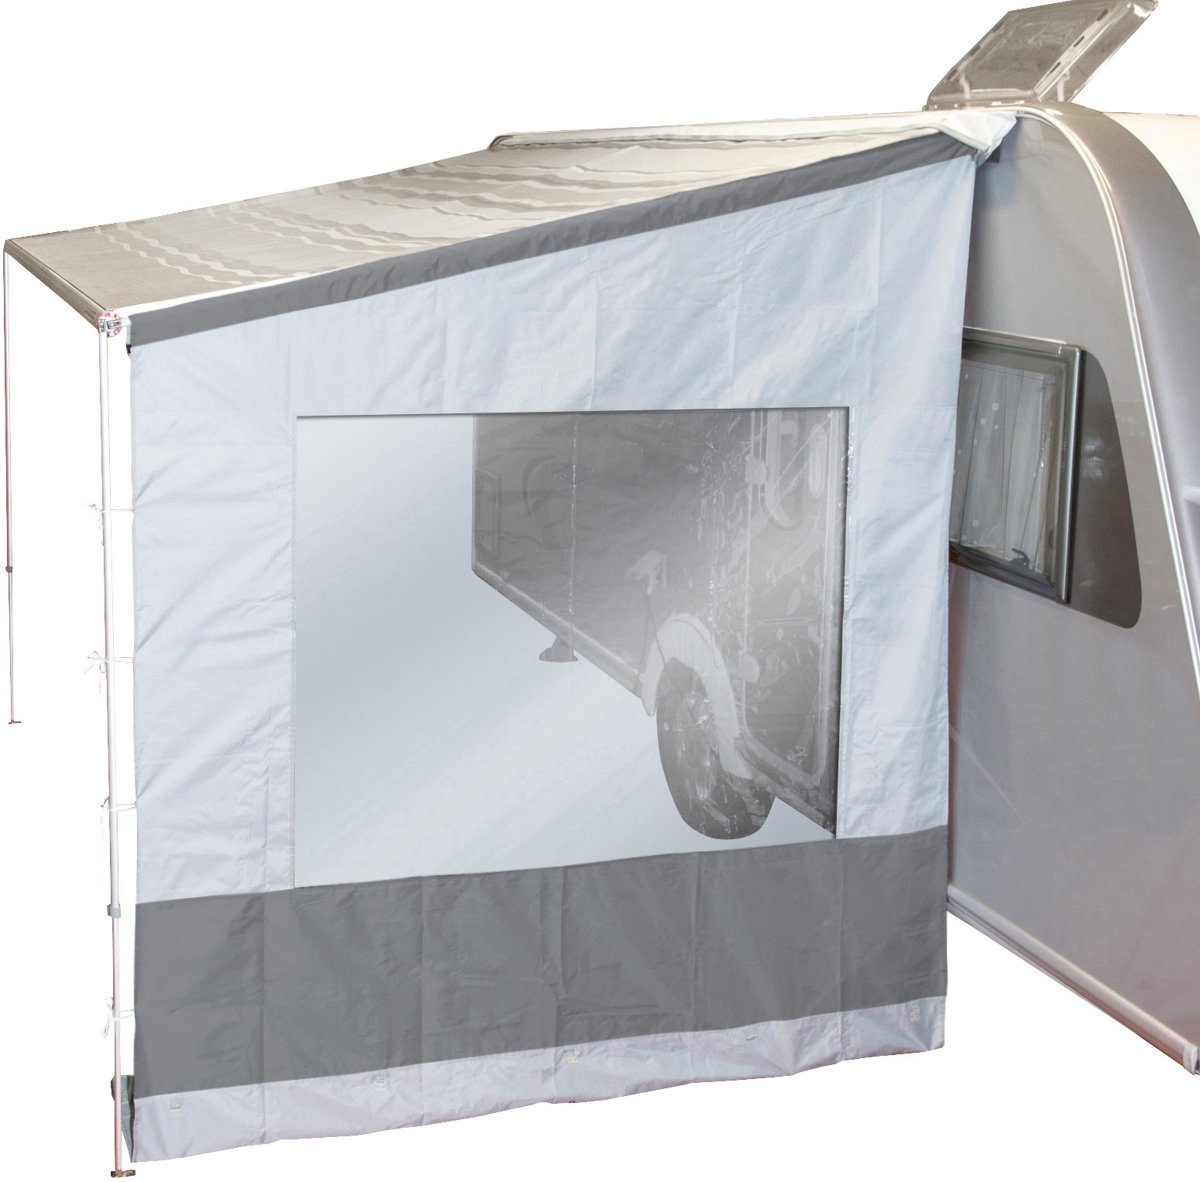 460x240 cm Travel Caravan Awning Bo-Camp